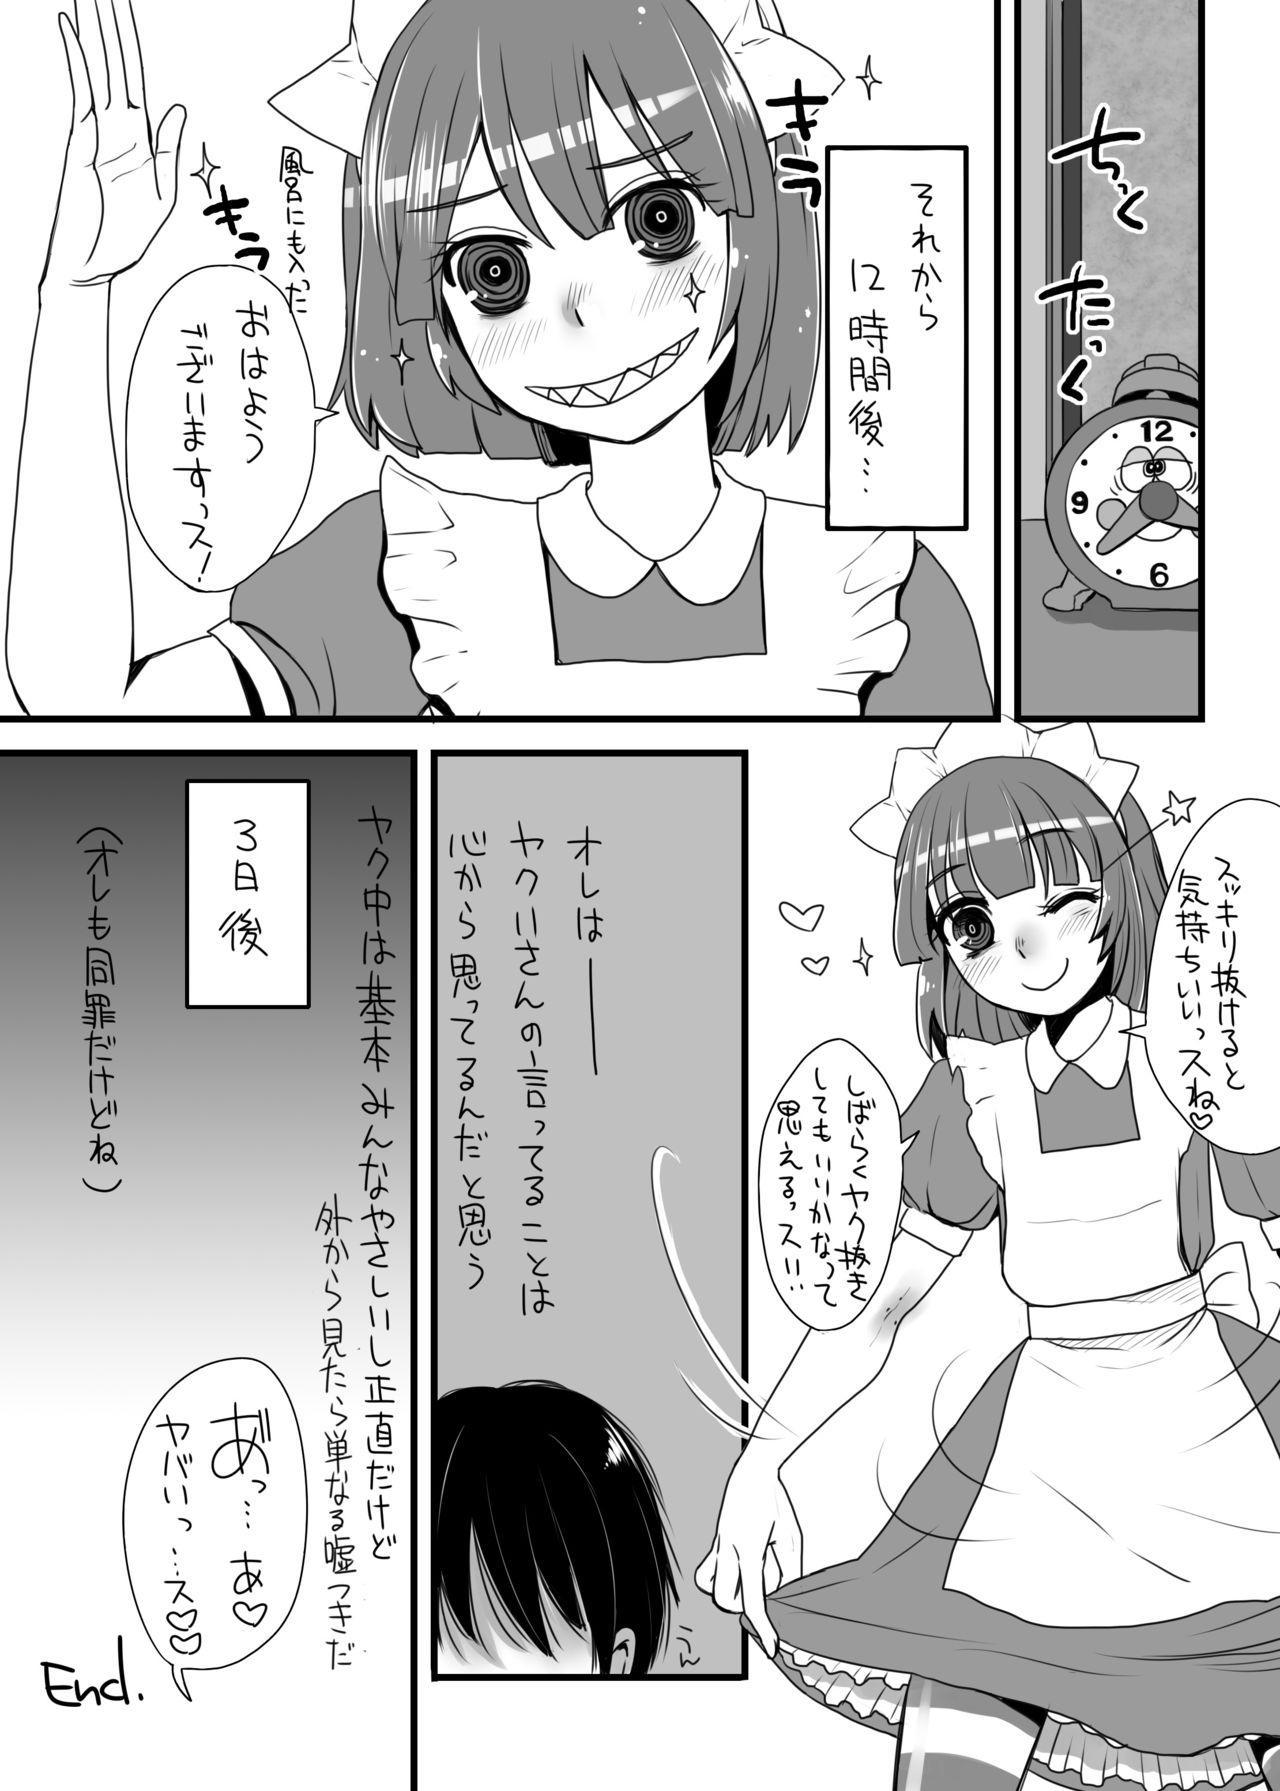 [Sarurururu (Doru Riheko)] Yakui-san Ero  Soushuuhen 2013-2016 (Nijiura Maids) [Digital] 14